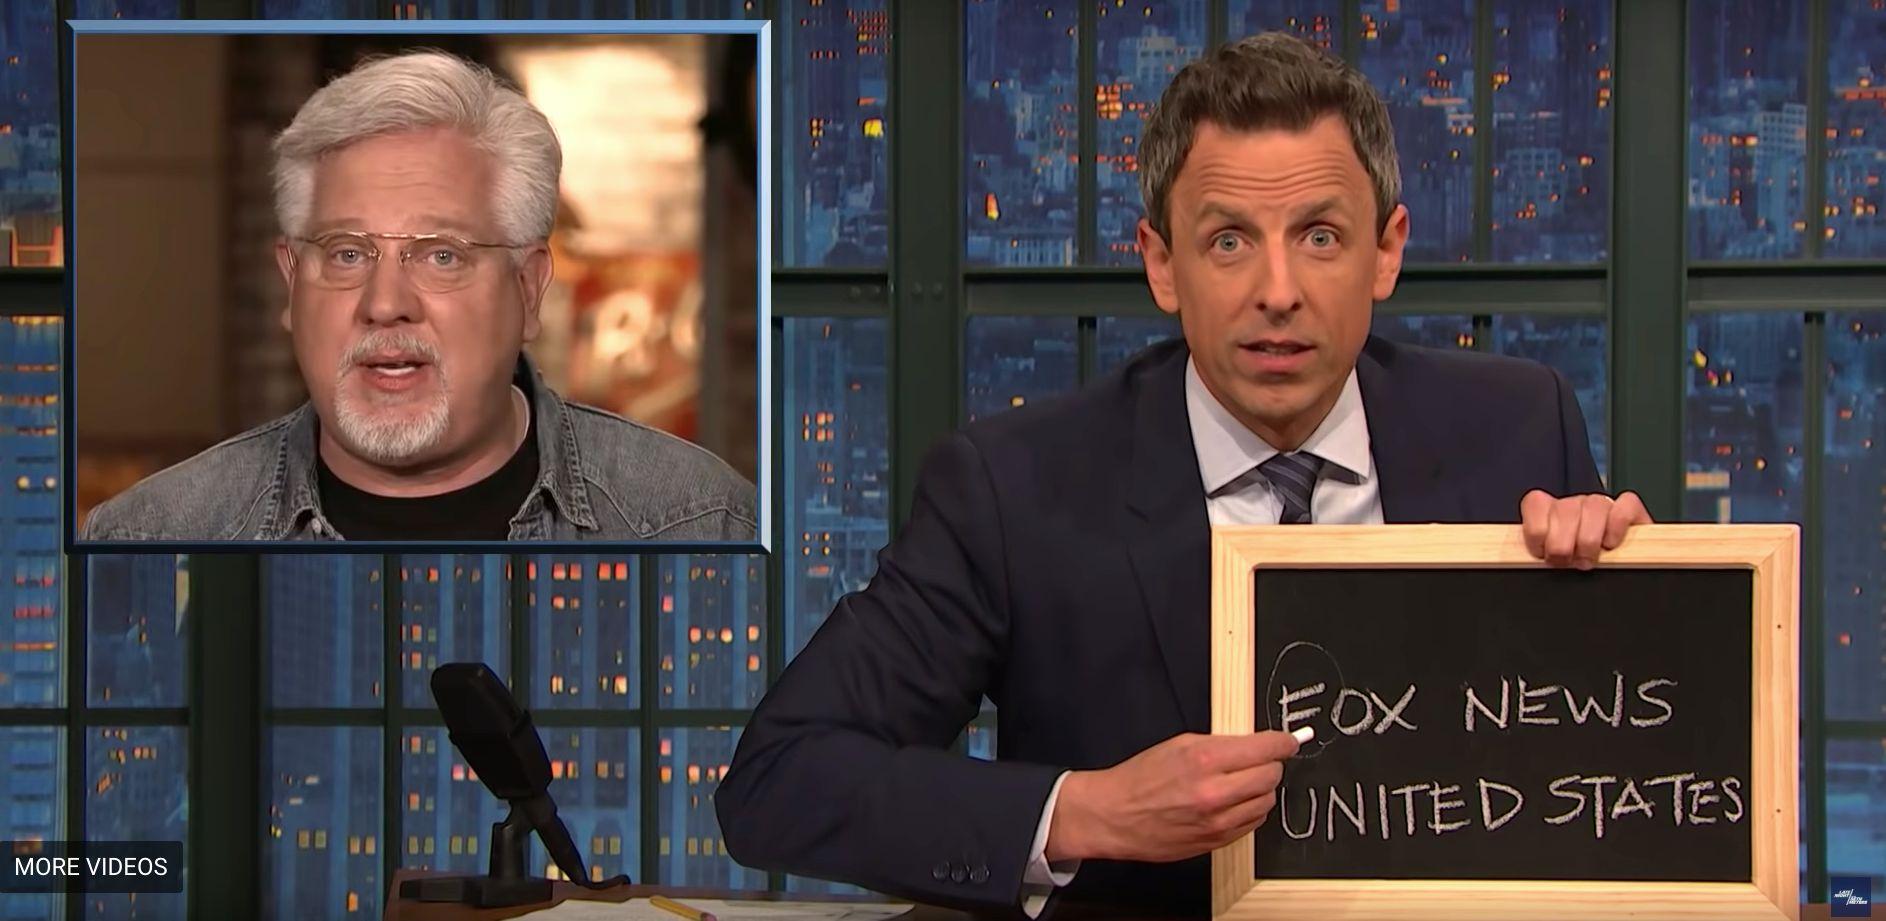 Seth Meyers Trolls Glenn Beck With A Not-So-Subtle Chalkboard Message